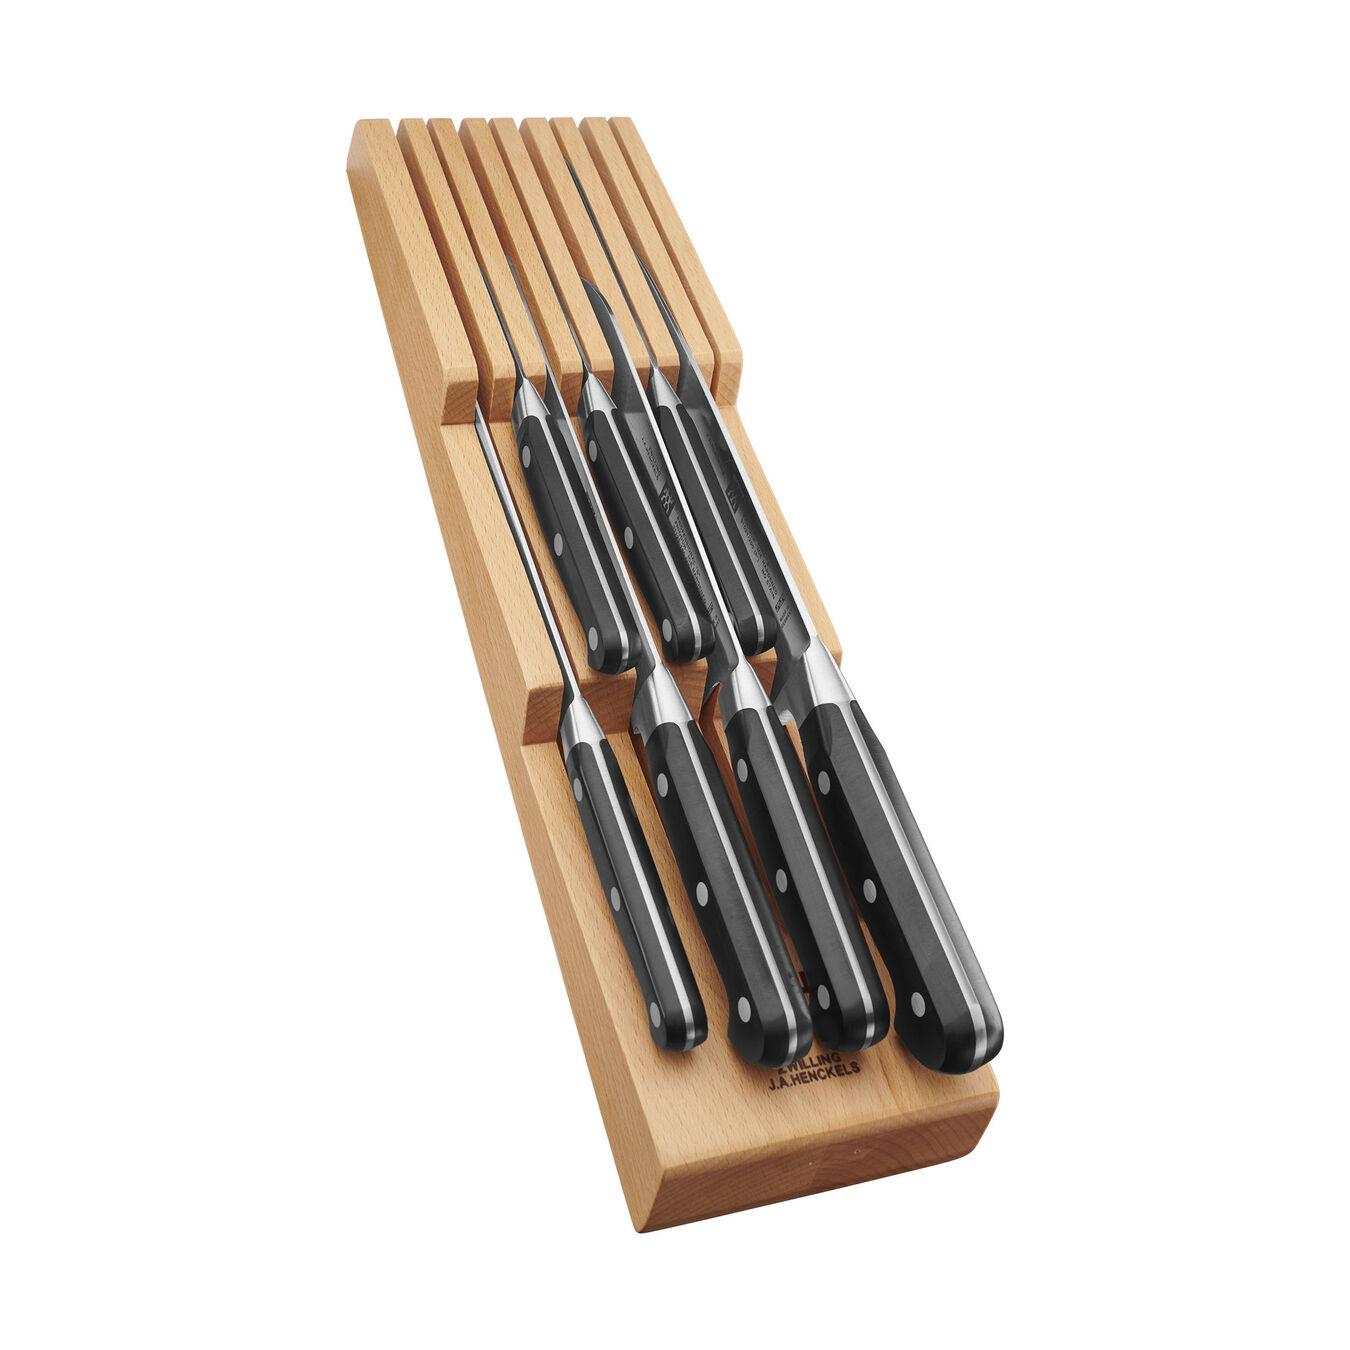 10-pc Knife block set ,,large 1